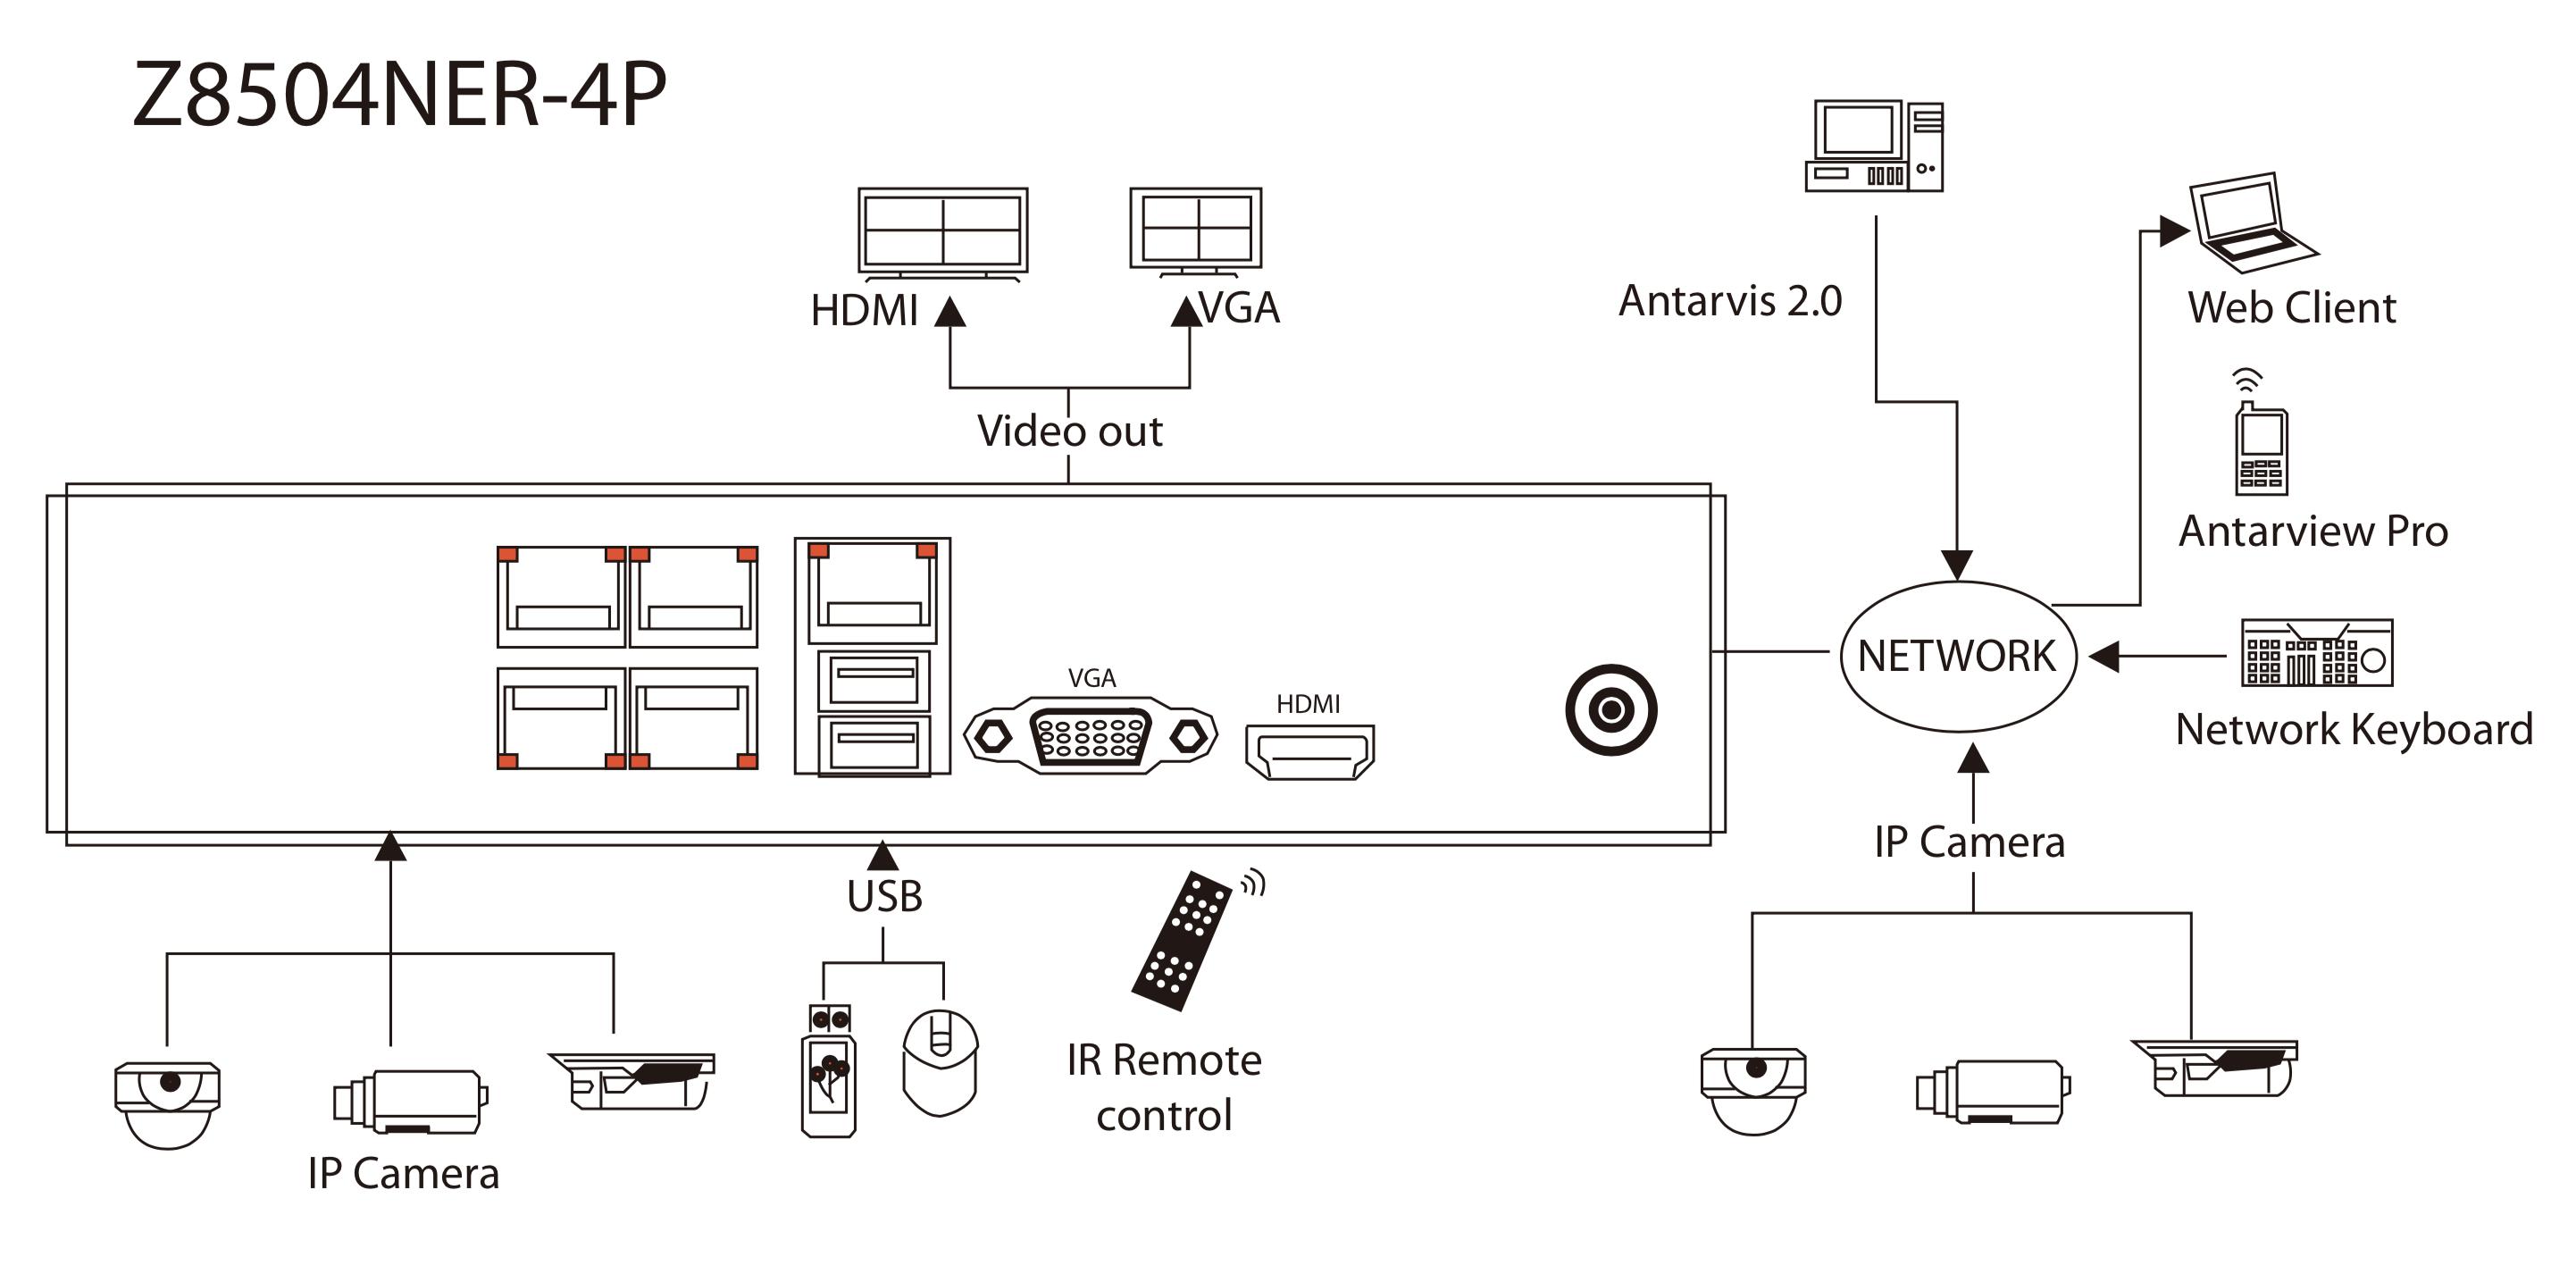 Z8504NER-4P Configuration Diagram